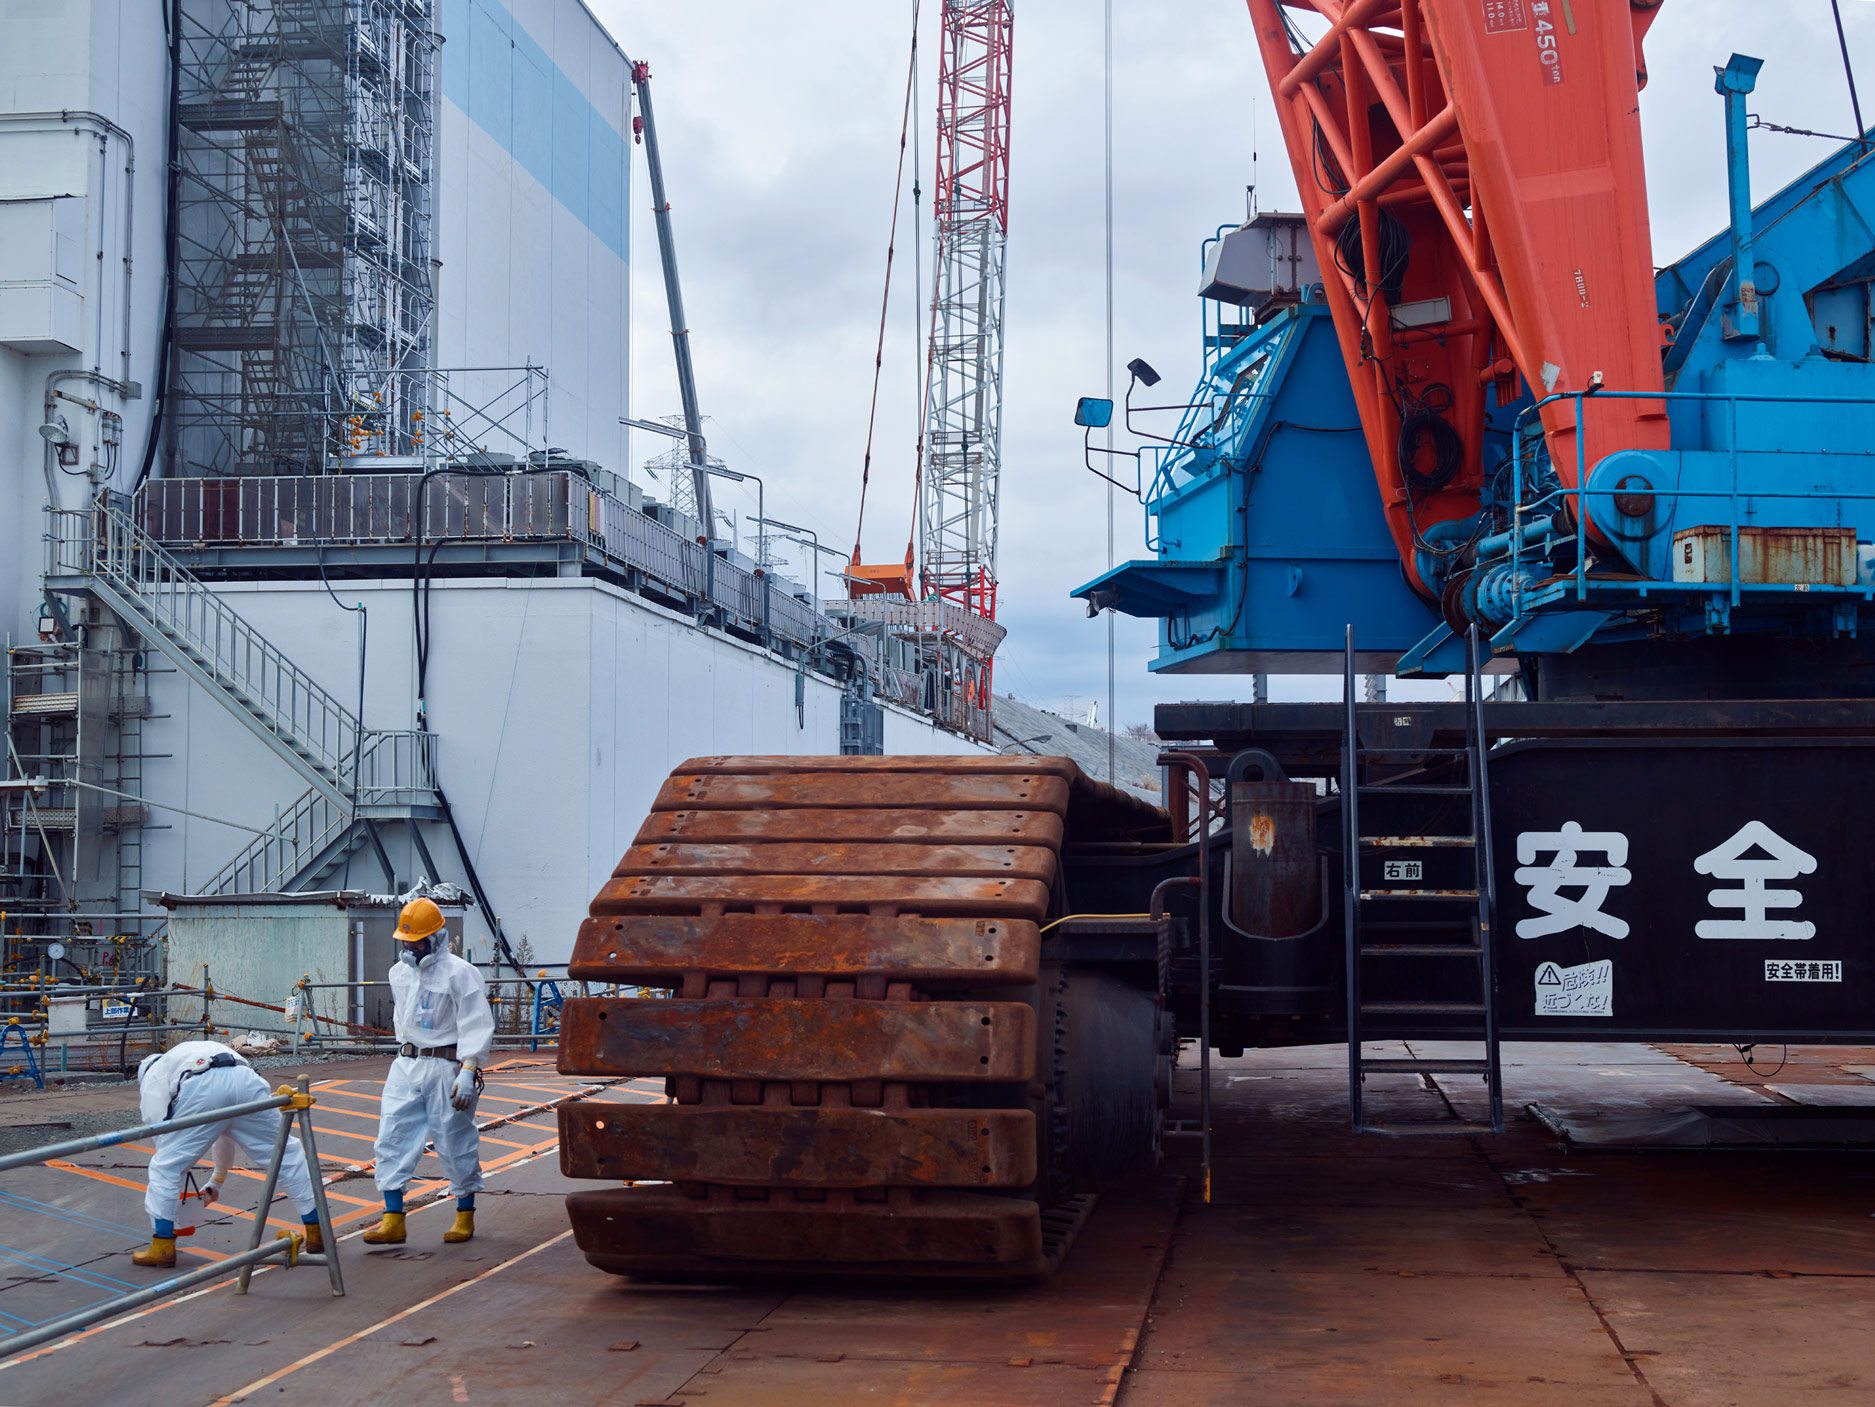 Unit 1 Turbine Building, Fukushima Daiichi Nuclear Power Plant, Japan, 2017